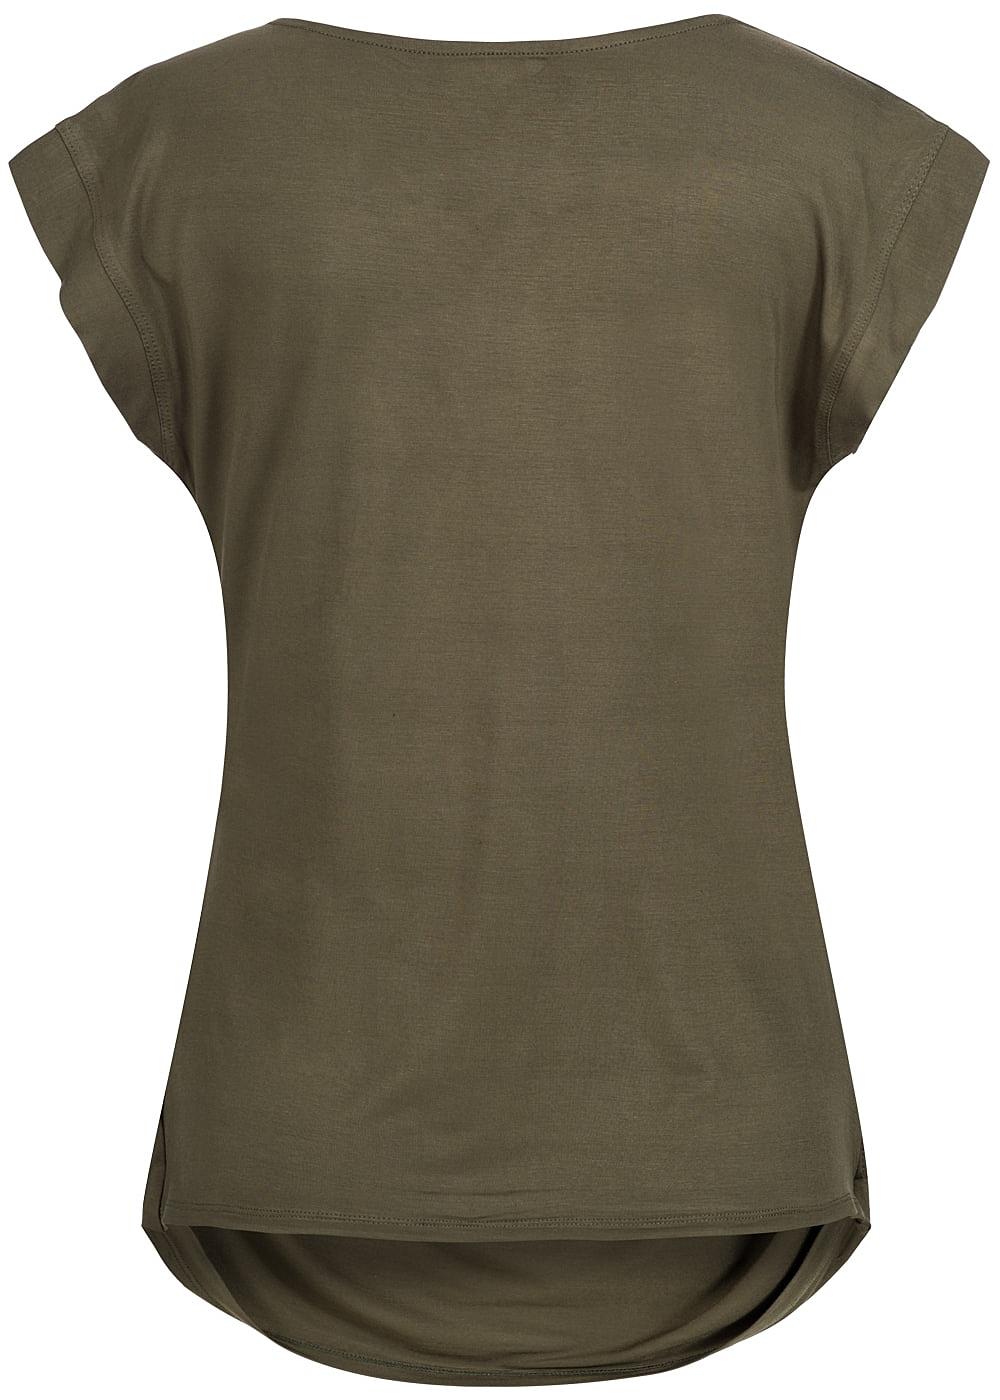 seventyseven lifestyle t shirt damen shirt mit kette. Black Bedroom Furniture Sets. Home Design Ideas